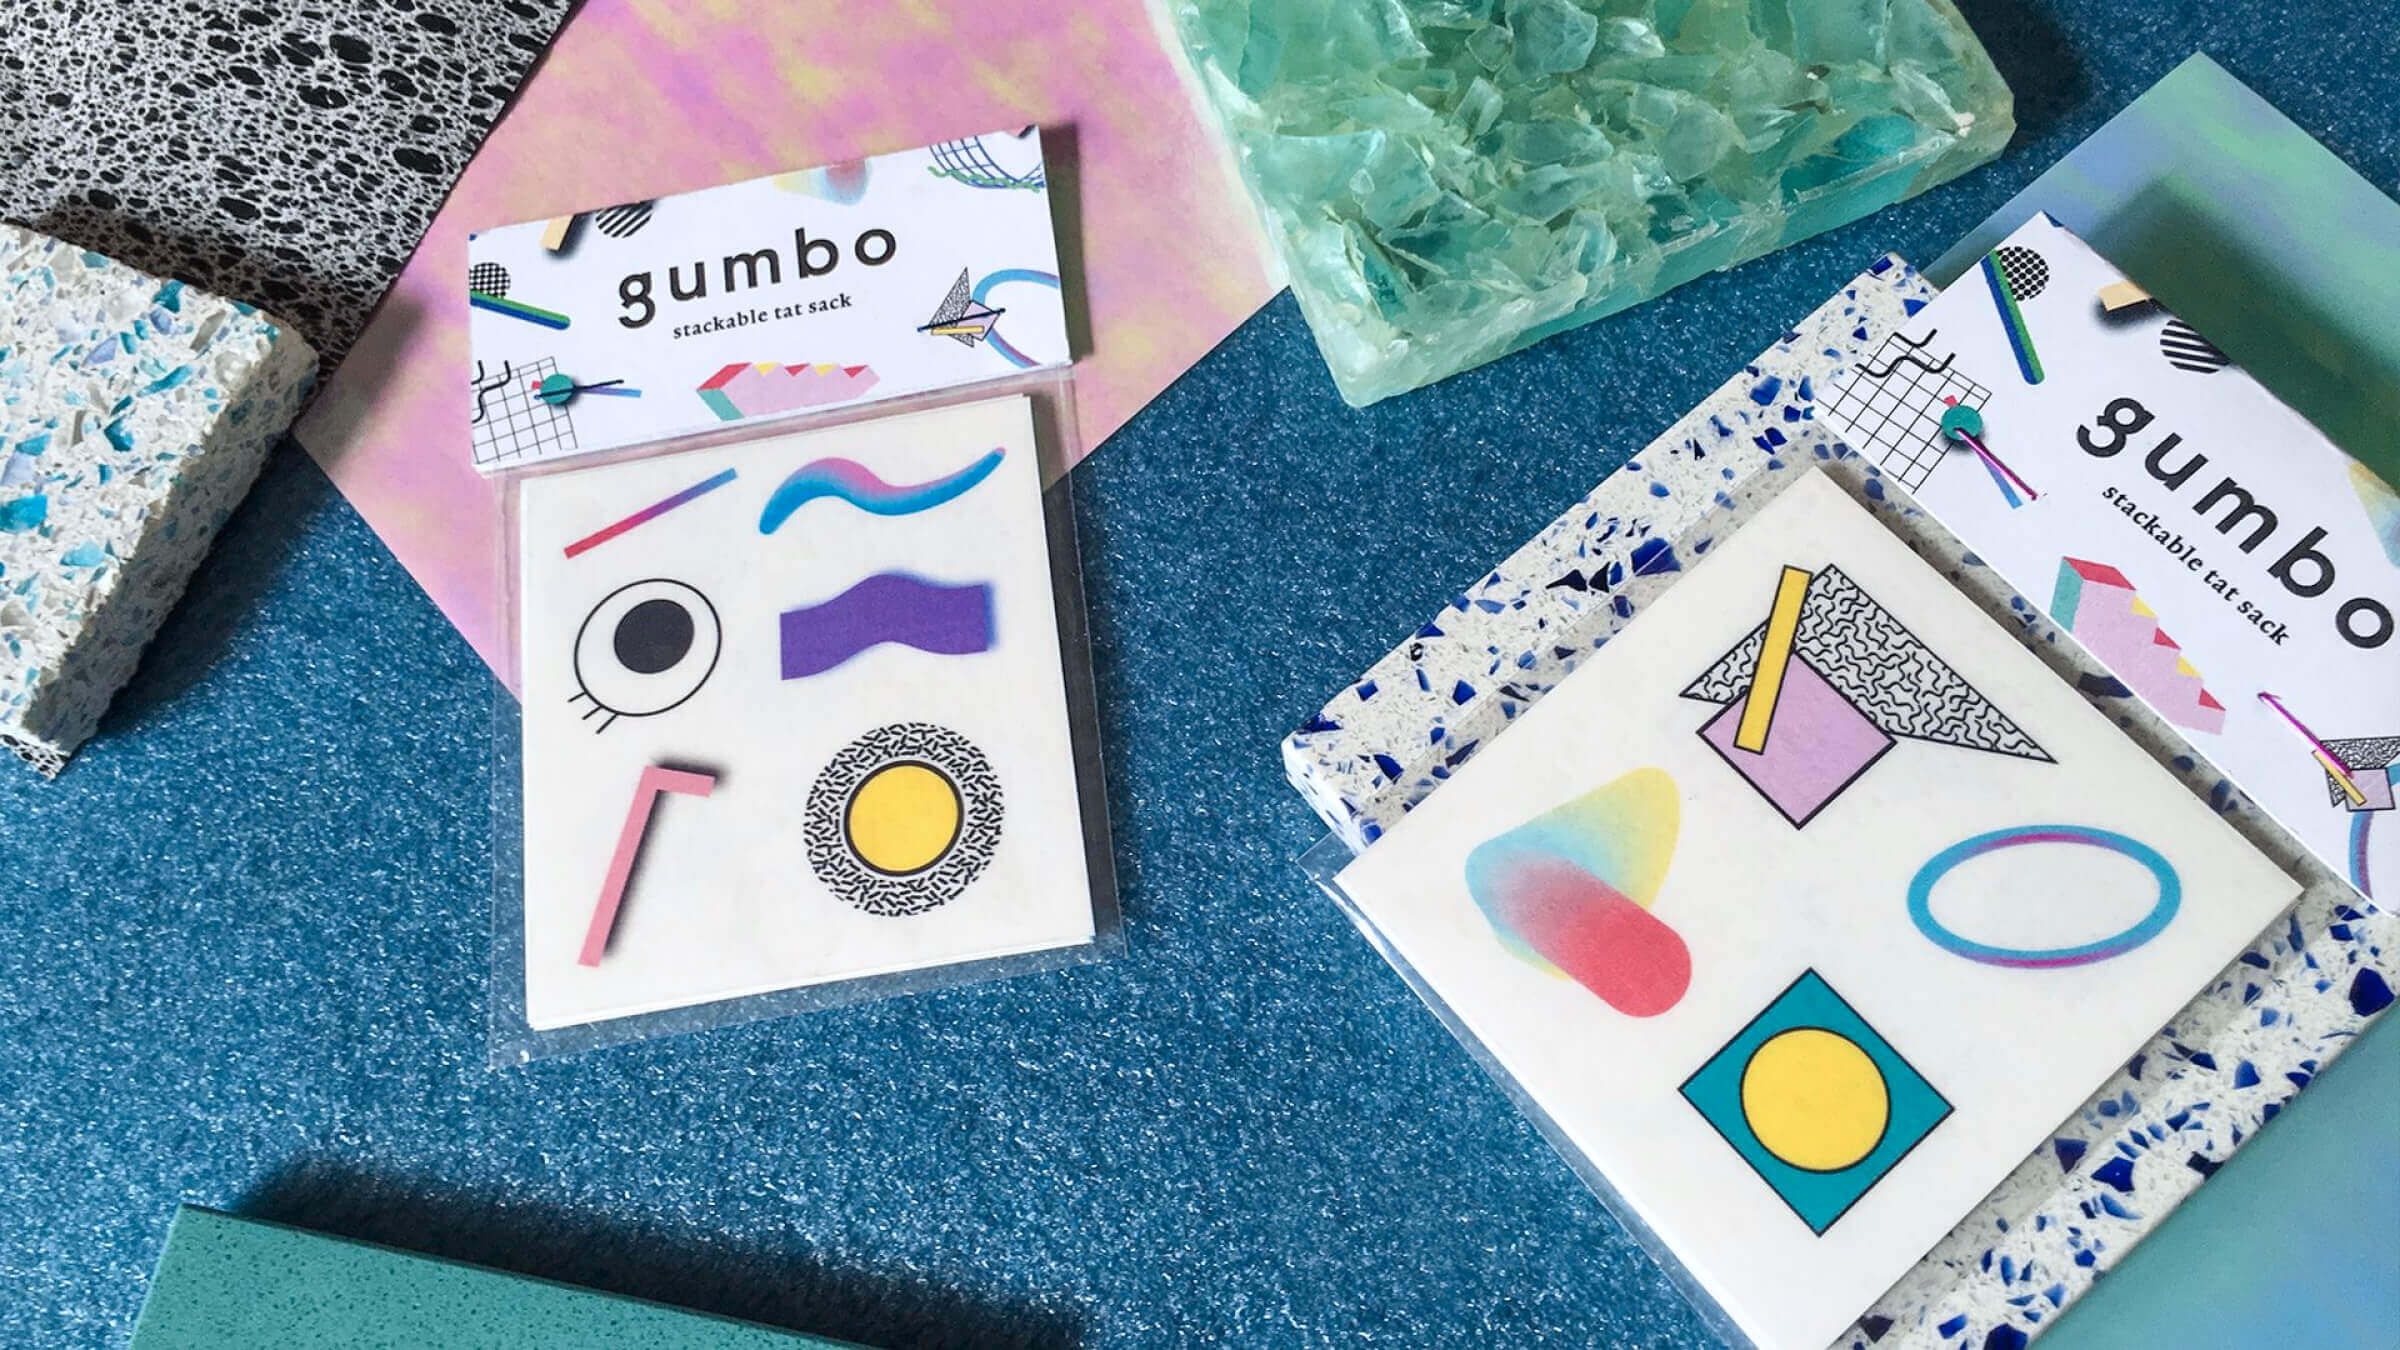 SSWeb-MoreWork-Gumbo-Top Cover Image